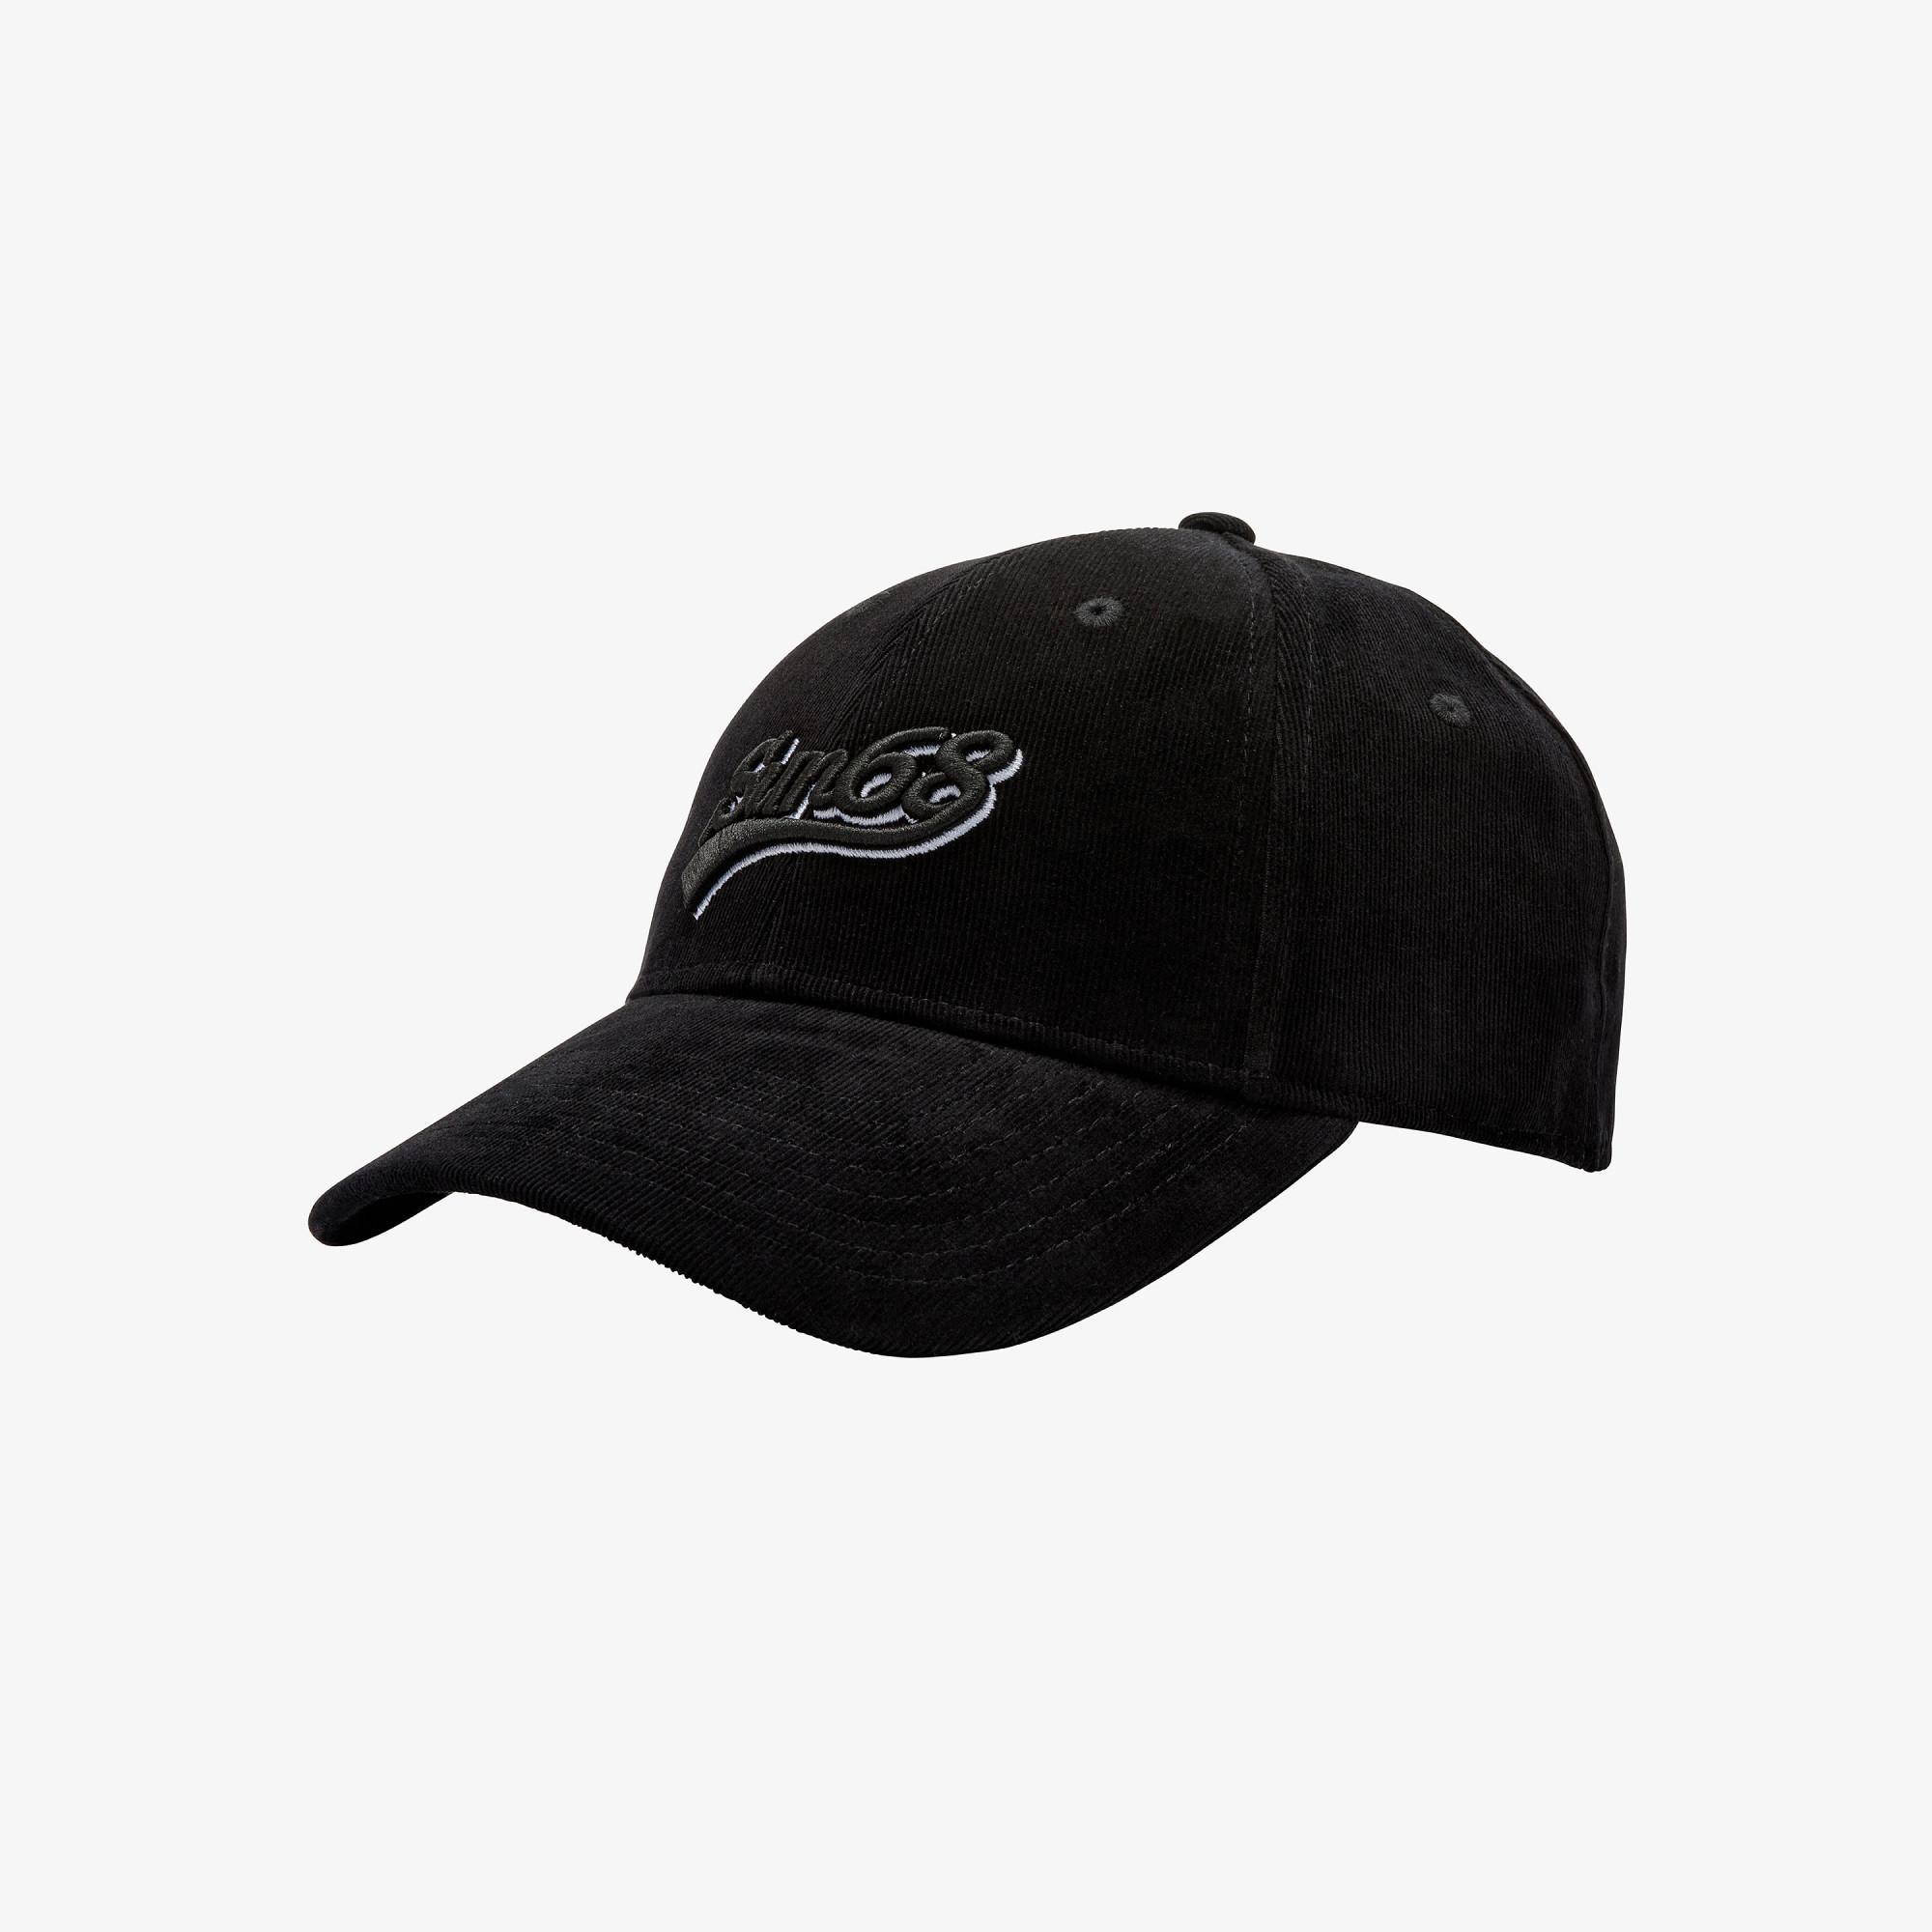 BASEBALL CAP CORDUROY BLACK